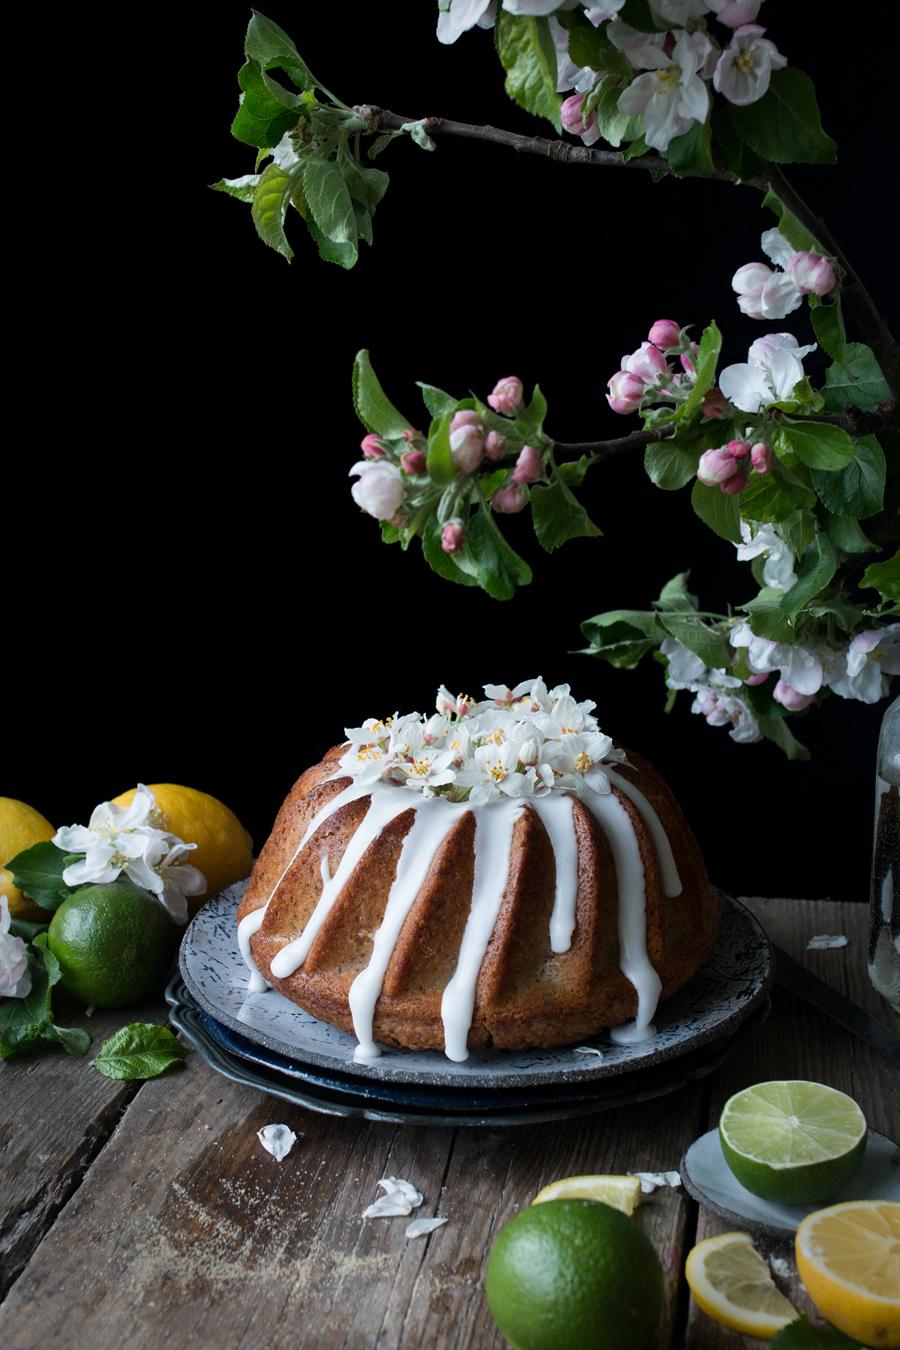 vegan-lemon-drizzle-cake-recipe-5